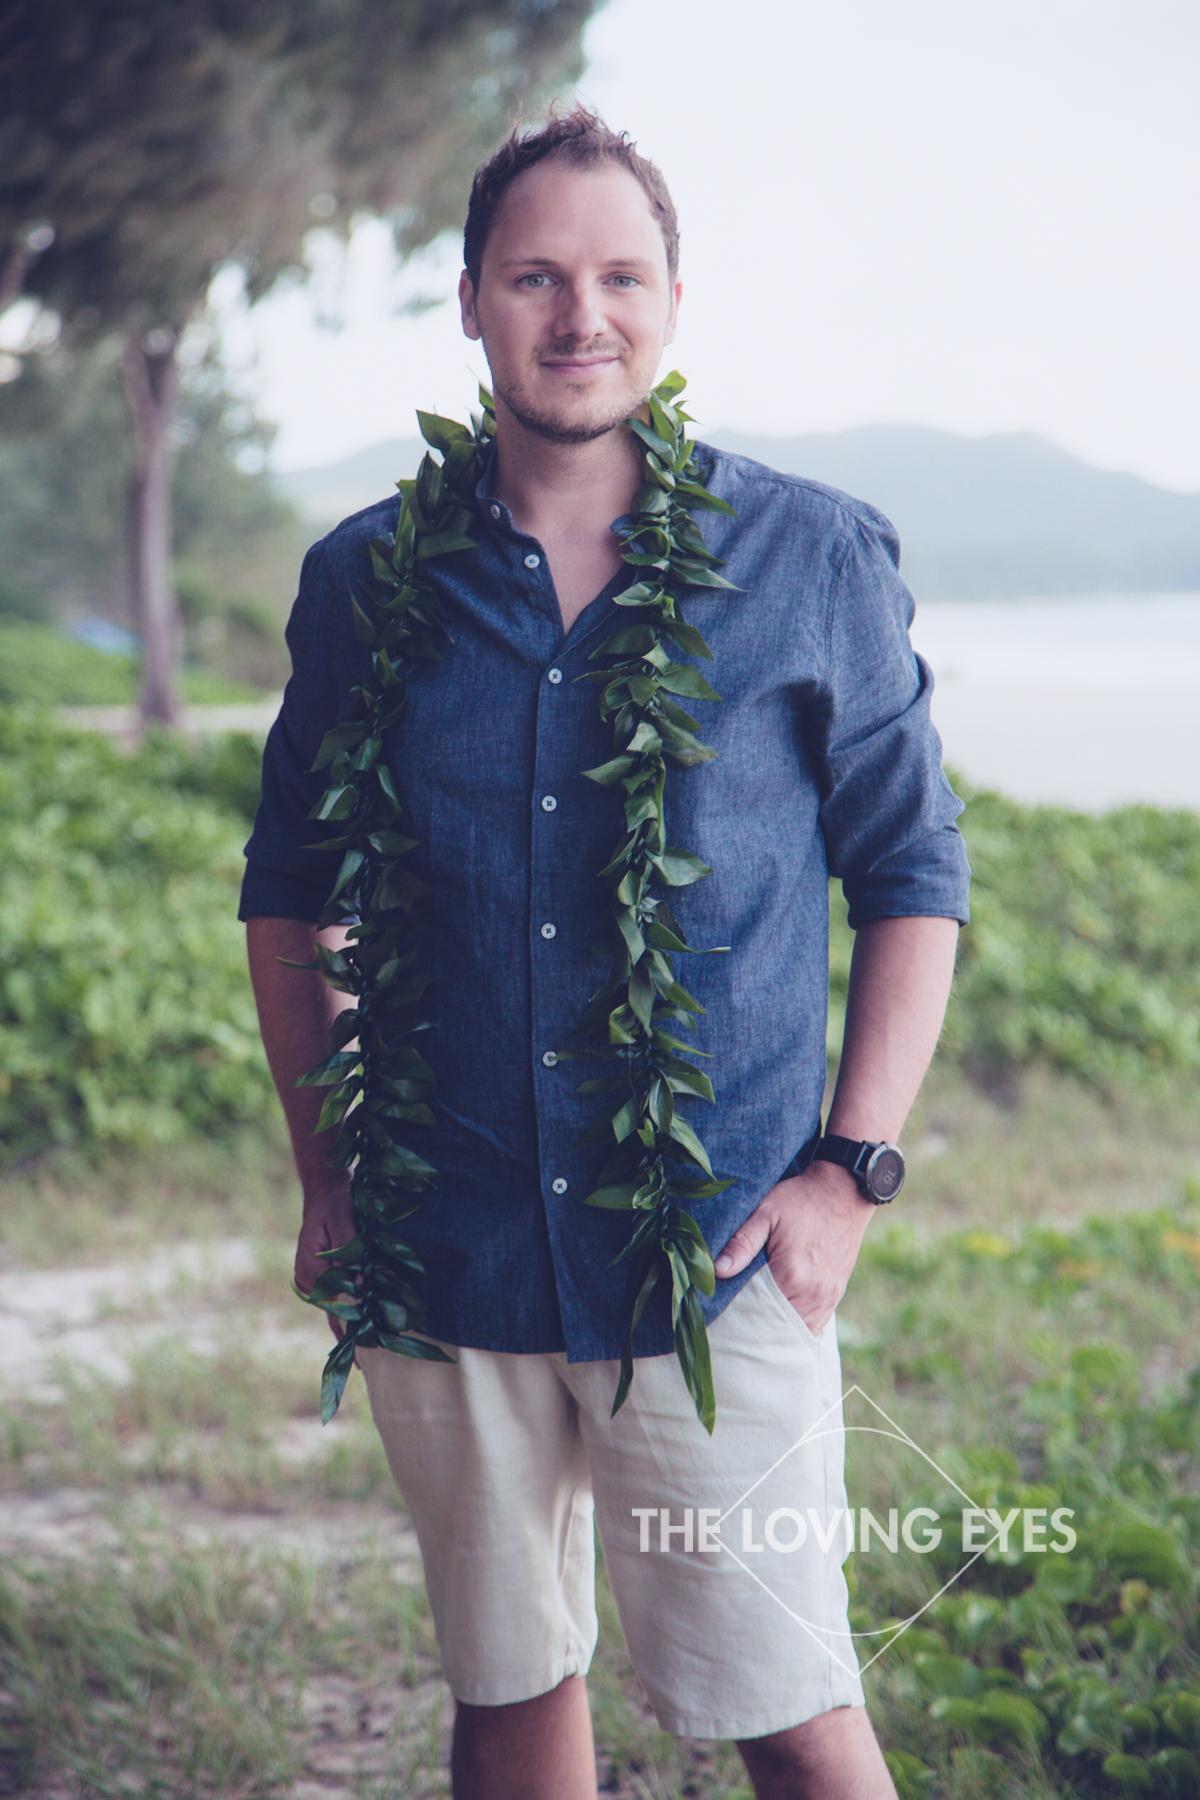 Stunning groom with lei on the beach in Hawaii